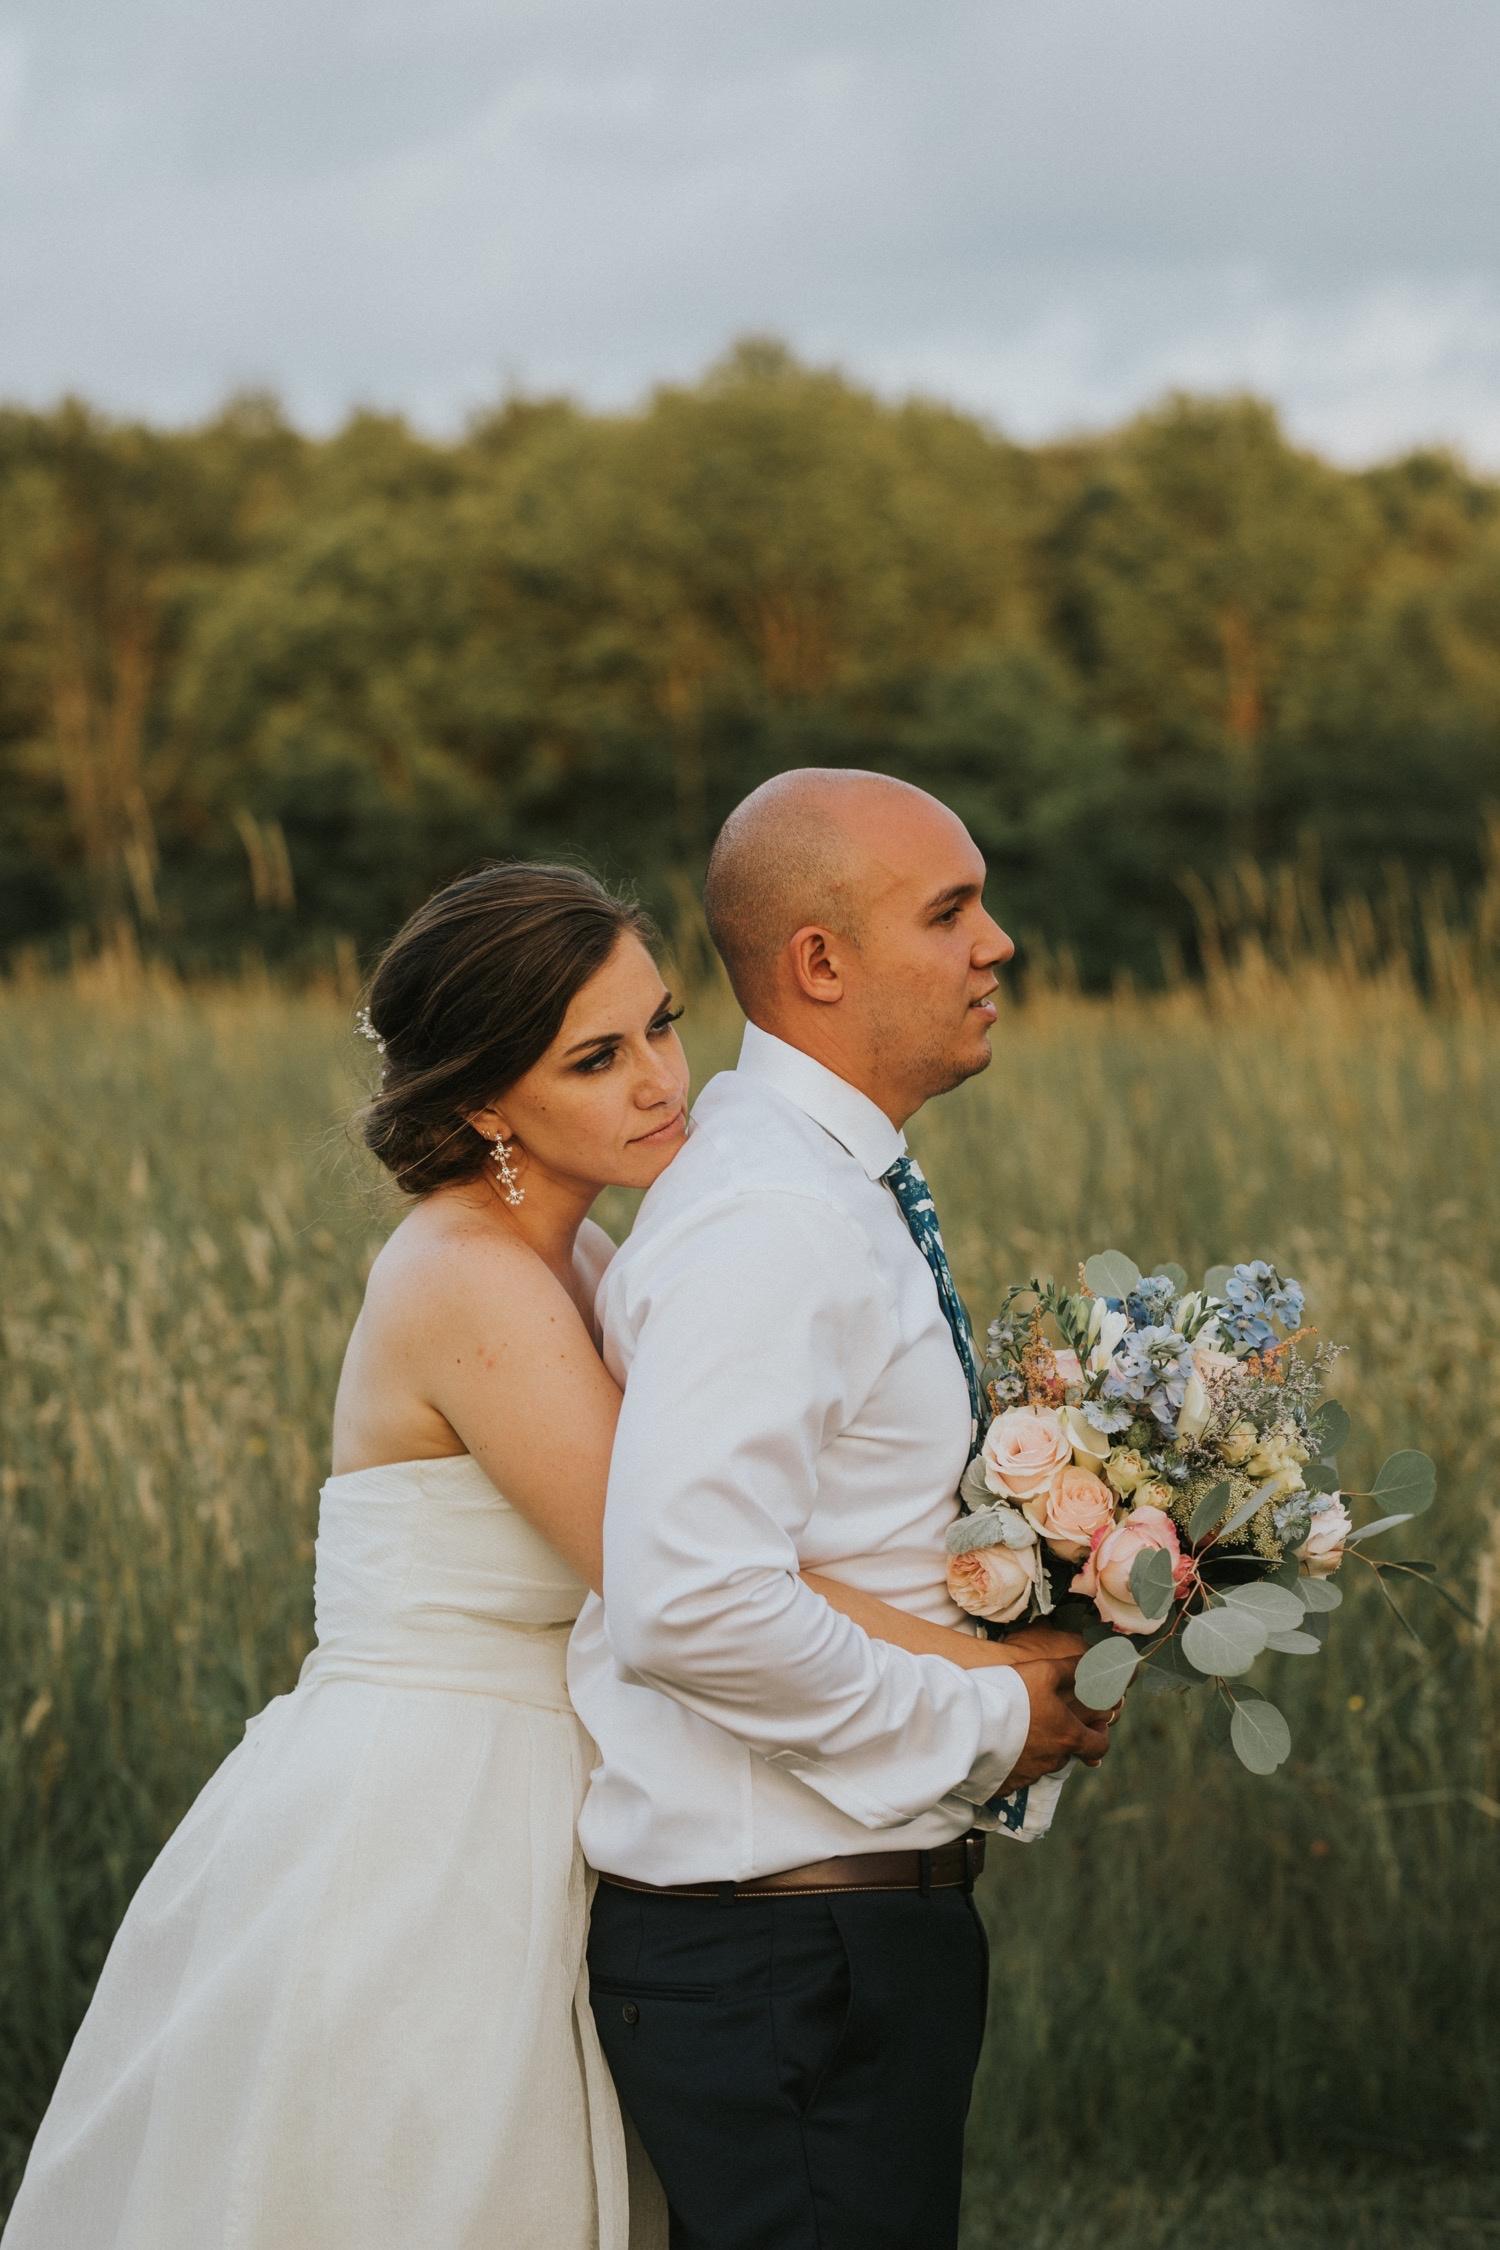 Wedding Invitations, Fiddle Lakes Farm, Fiddle Lakes Wedding, Hudson Valley Wedding Photographer, New York Wedding Photographer, Bridal PArty, Sunset Photos